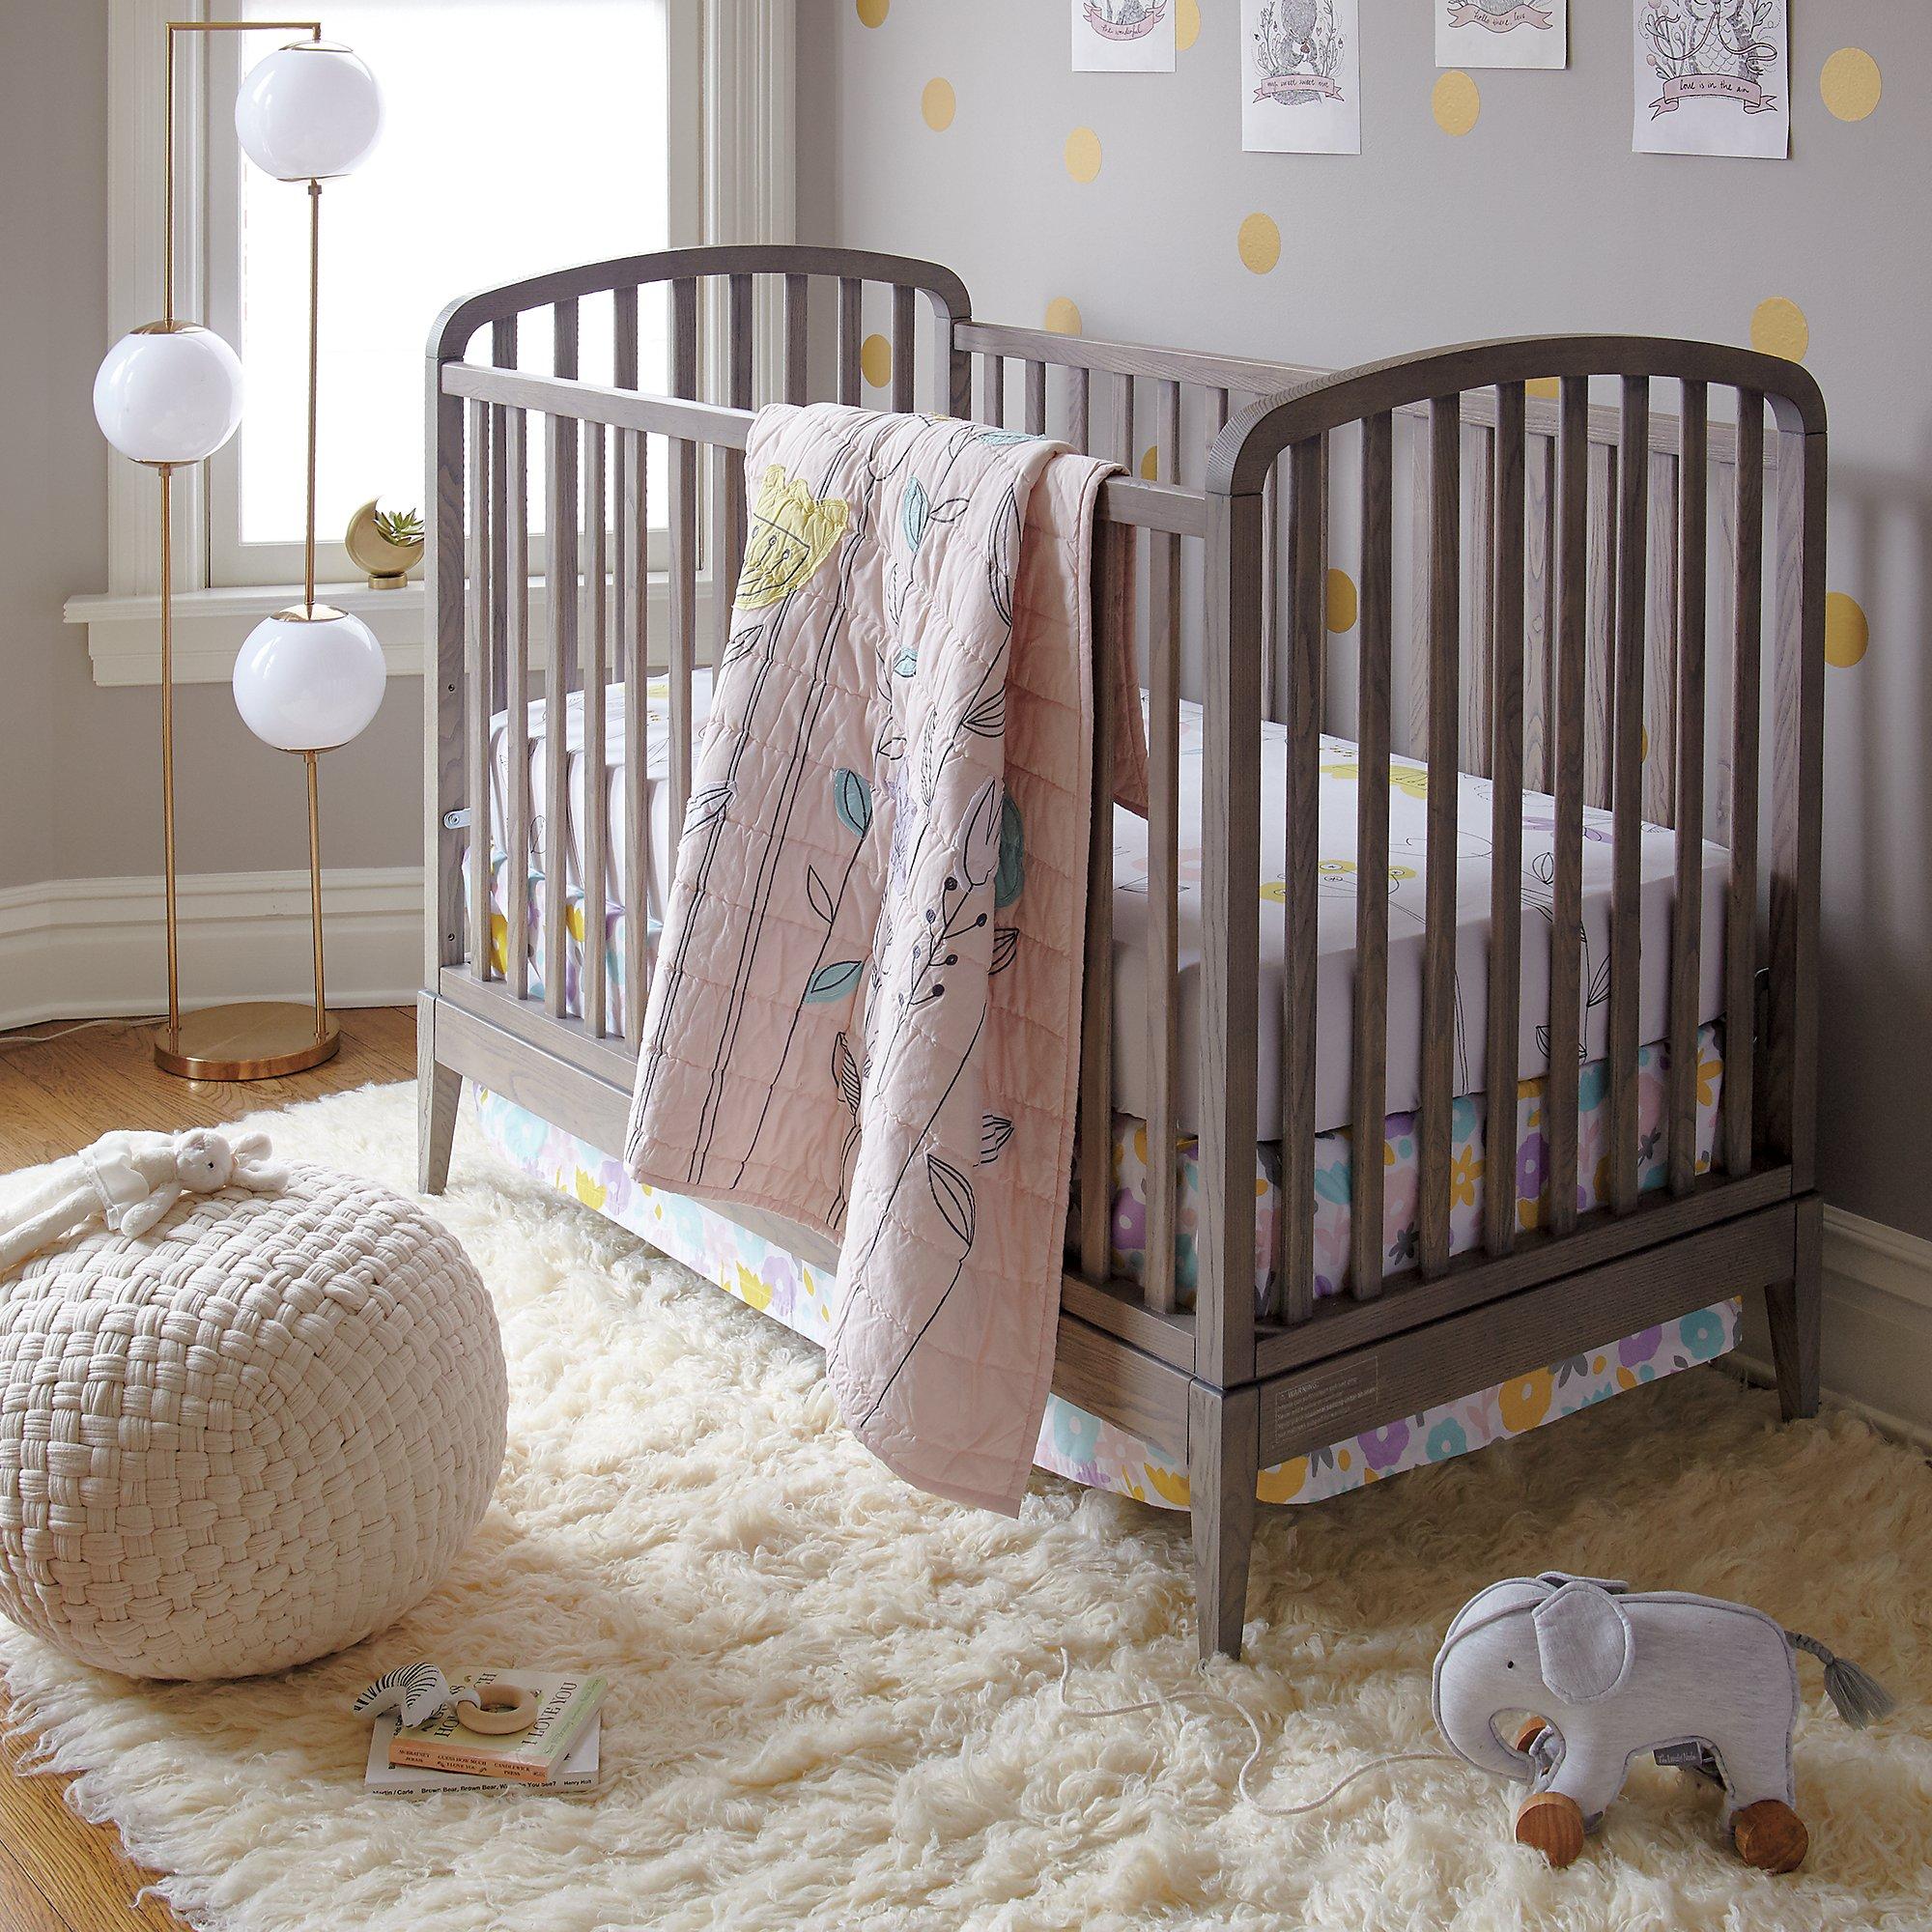 floral-suite-baby-quilt8.jpg